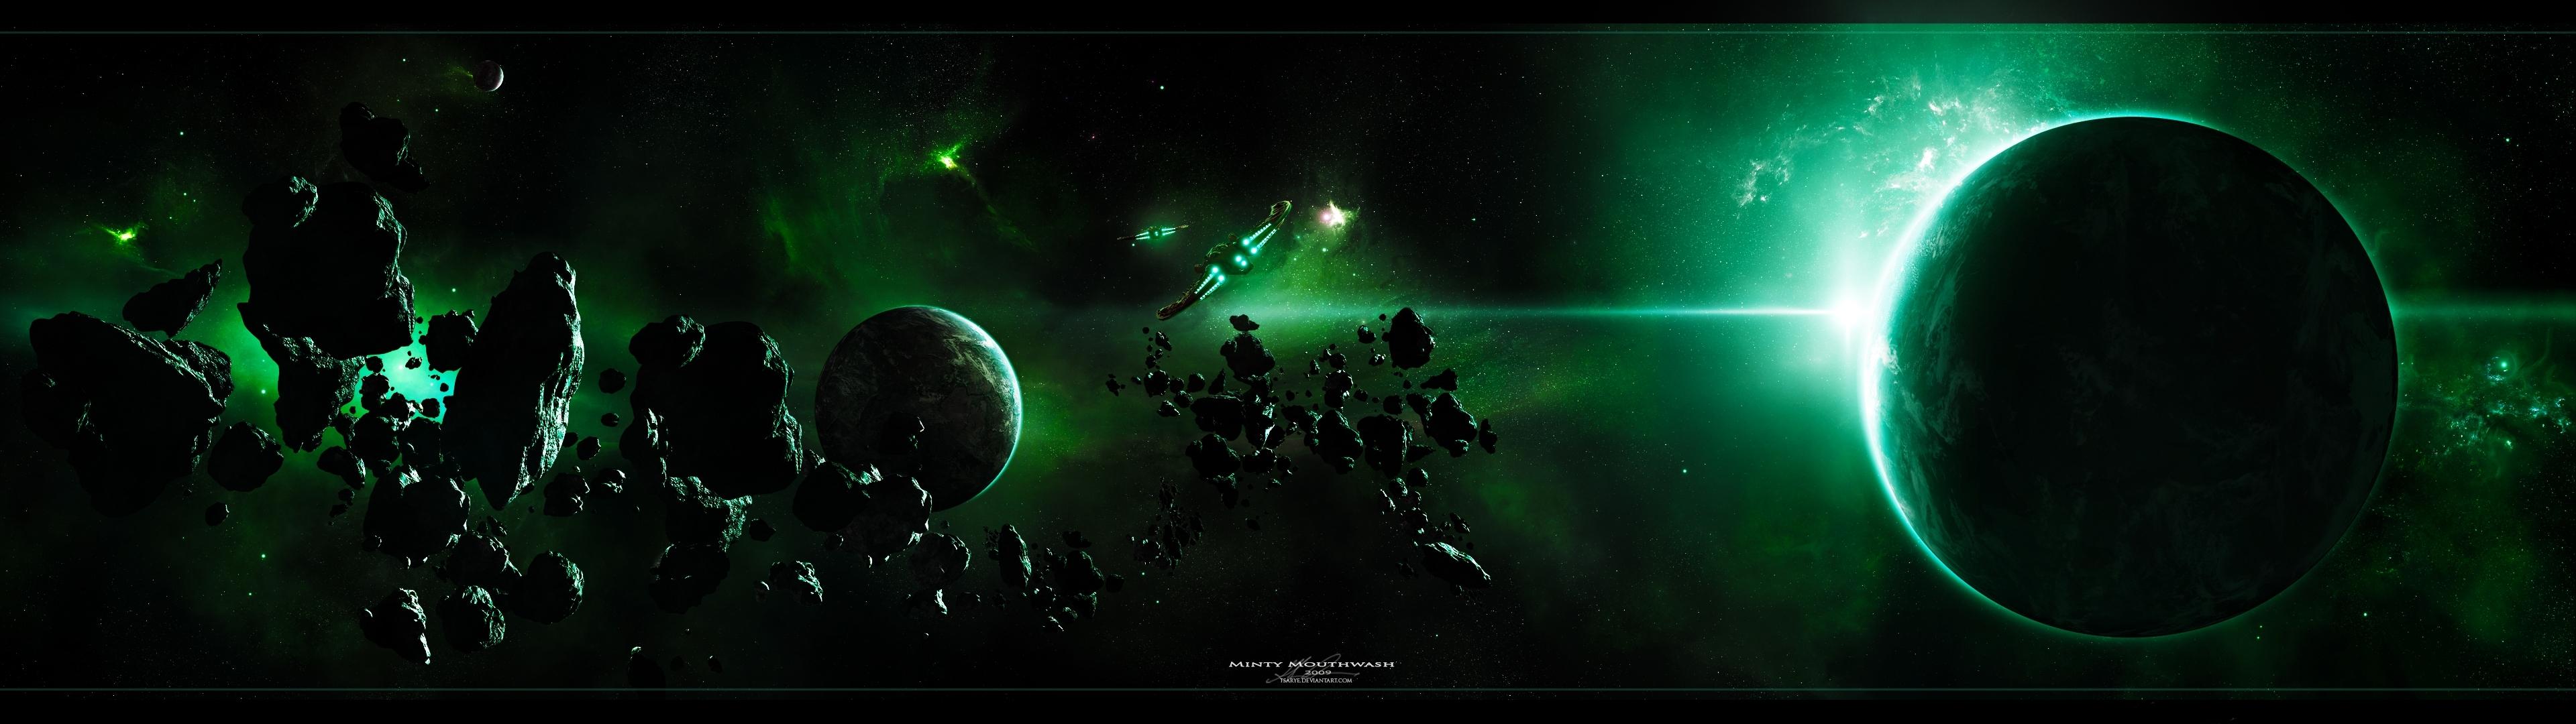 space planets dual screen 3840x1080 wallpaper Wallpaper 3840x1080